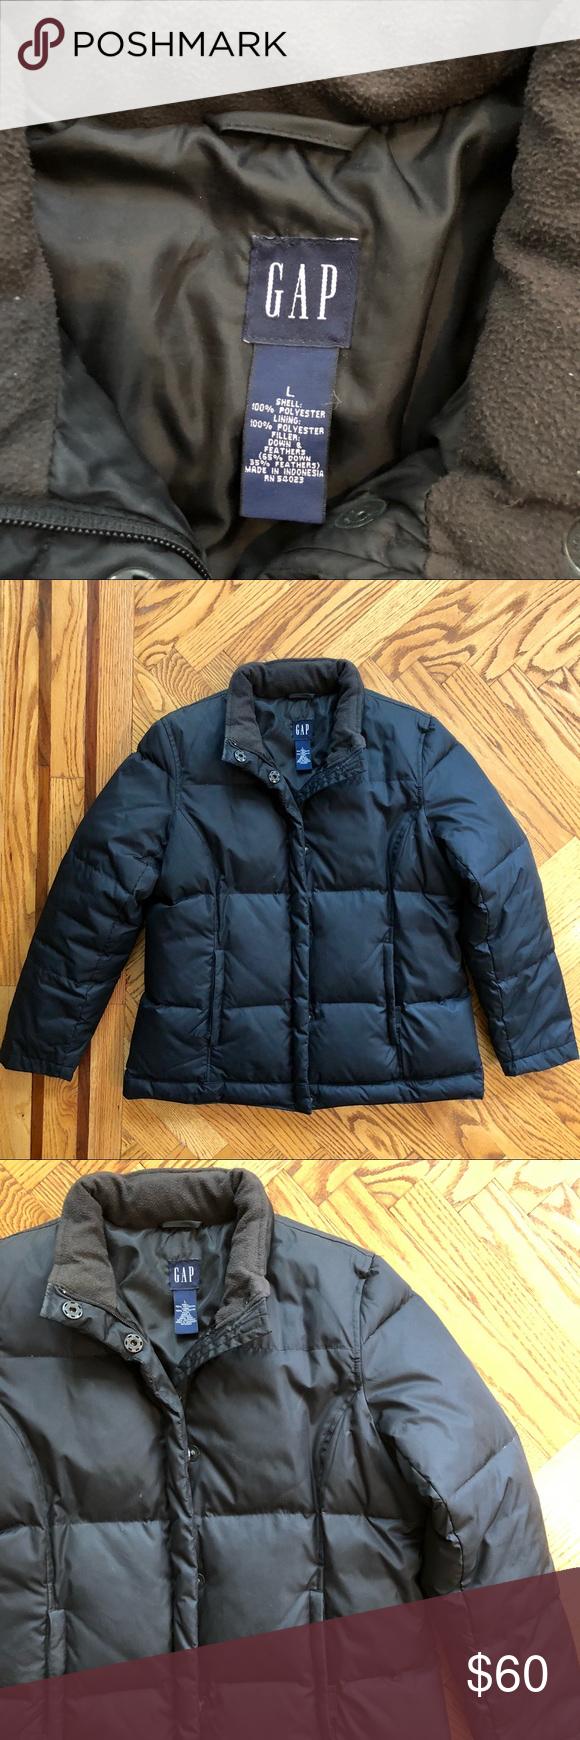 Gap Down Puffer Jacket Like New Size L Jackets Gap Jacket Puffer Jackets [ 1740 x 580 Pixel ]